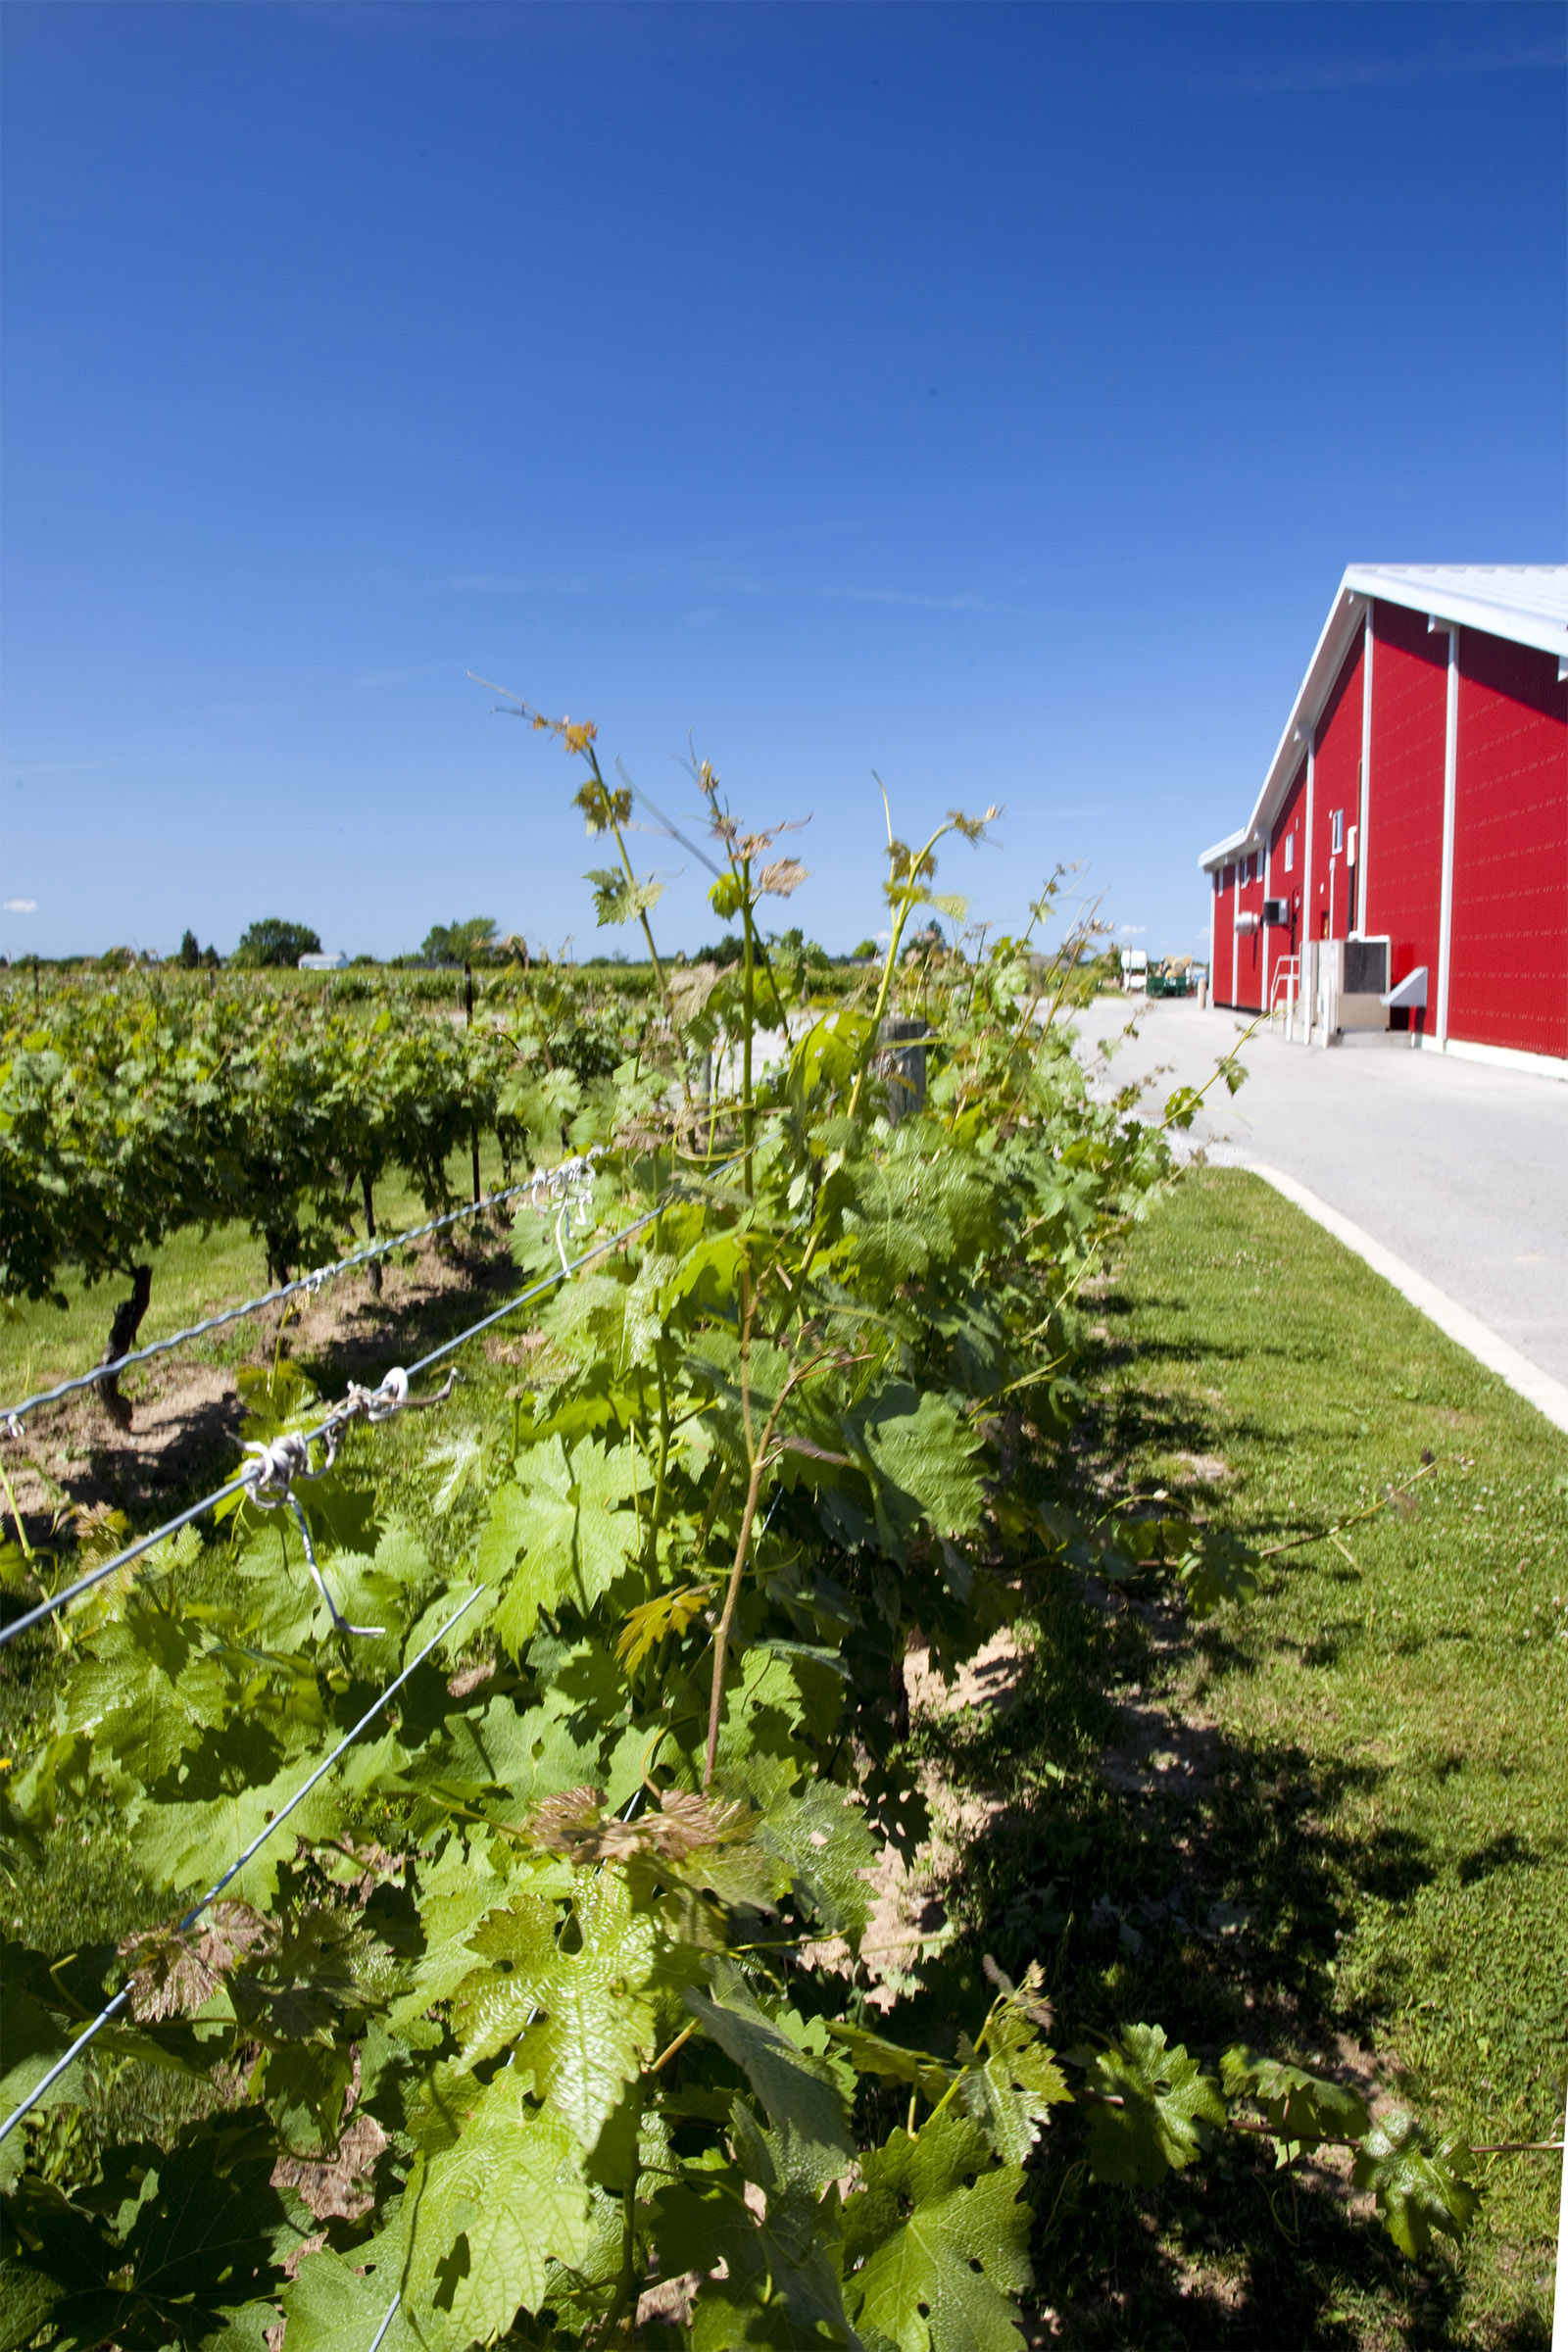 Vineyard, Spring, Sun, South, Scenic, HQ Photo